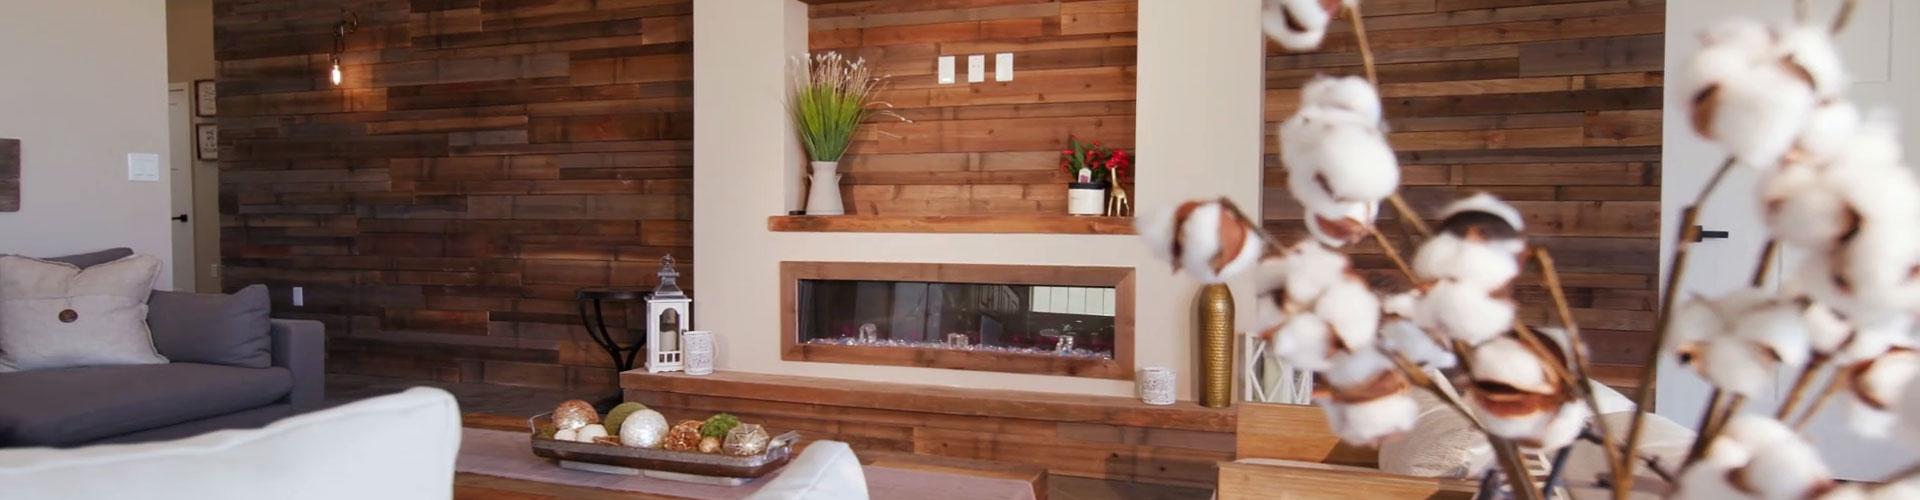 3D Wandpaneelen - Wandverkleidung für Holz-Look Wandpaneelen im ...